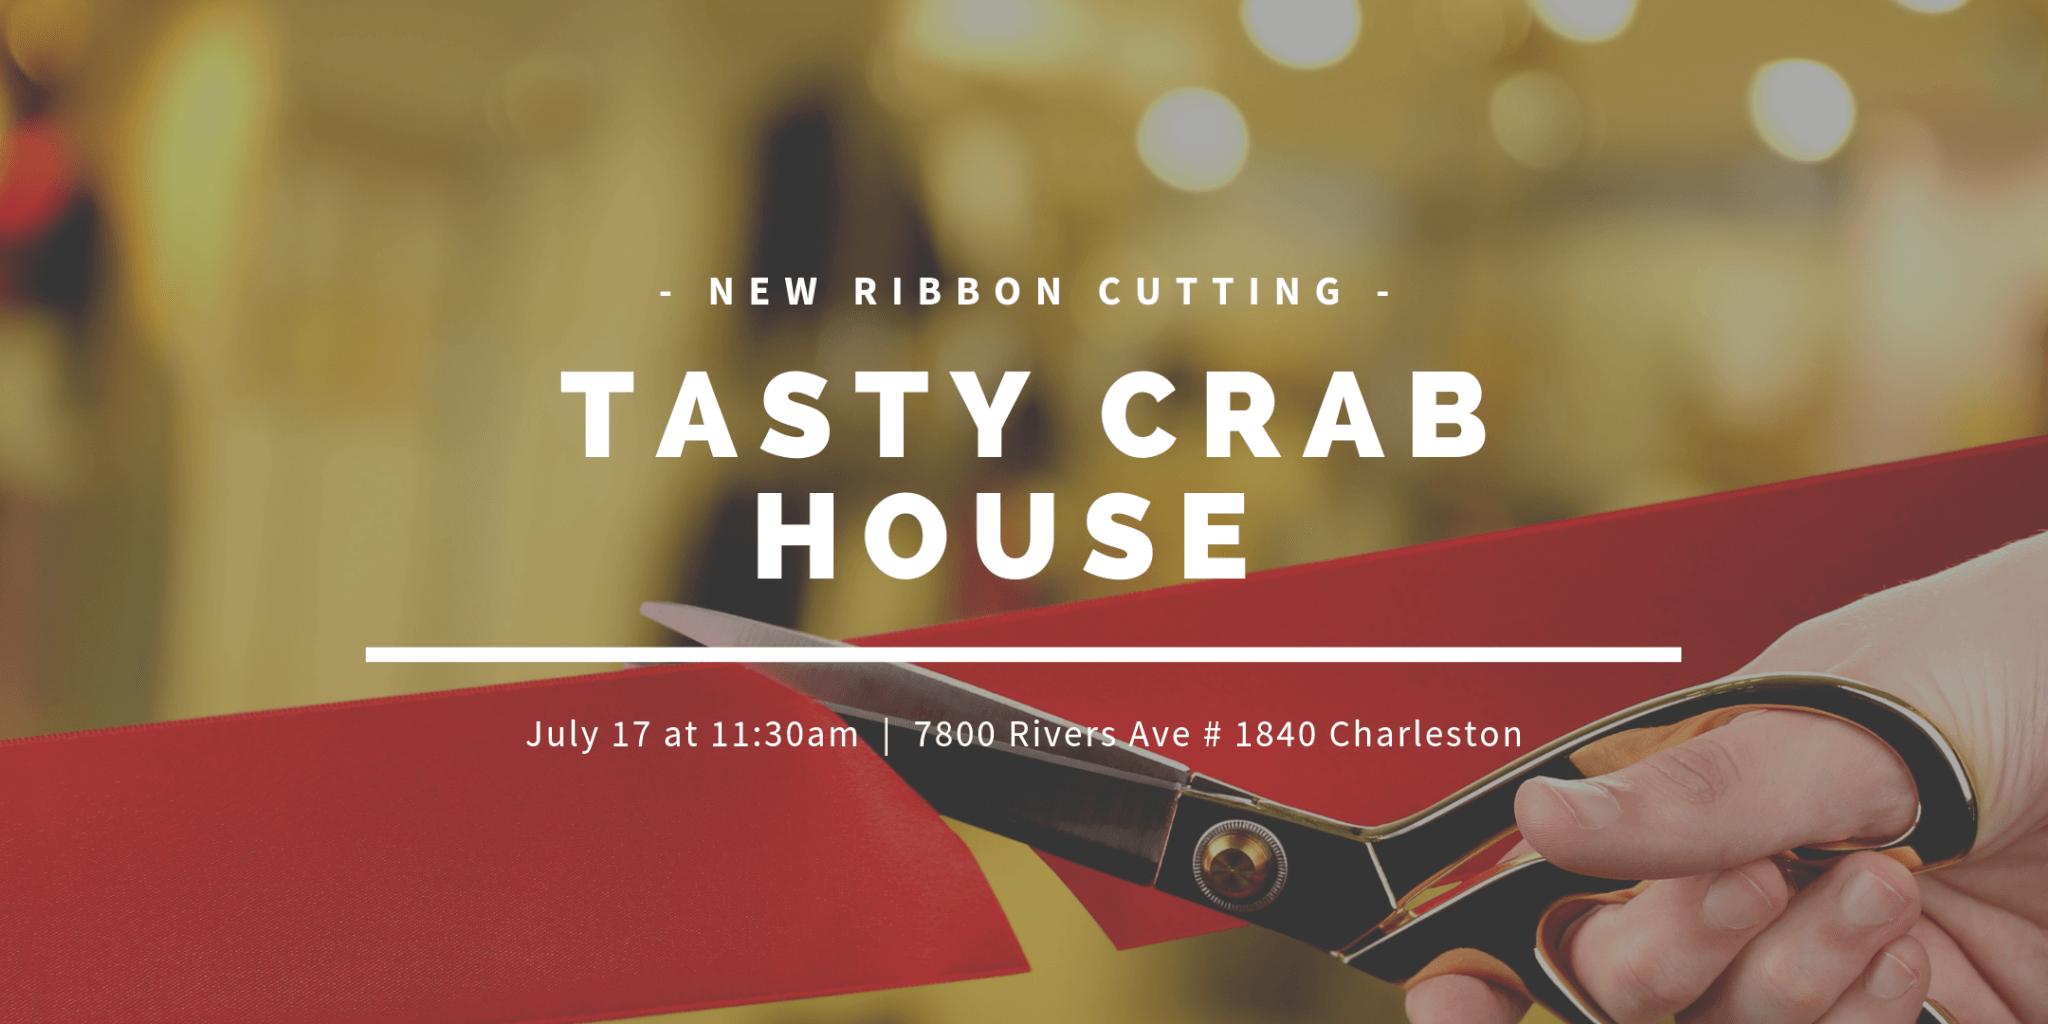 Tasty Crab House Ribbon Cutting